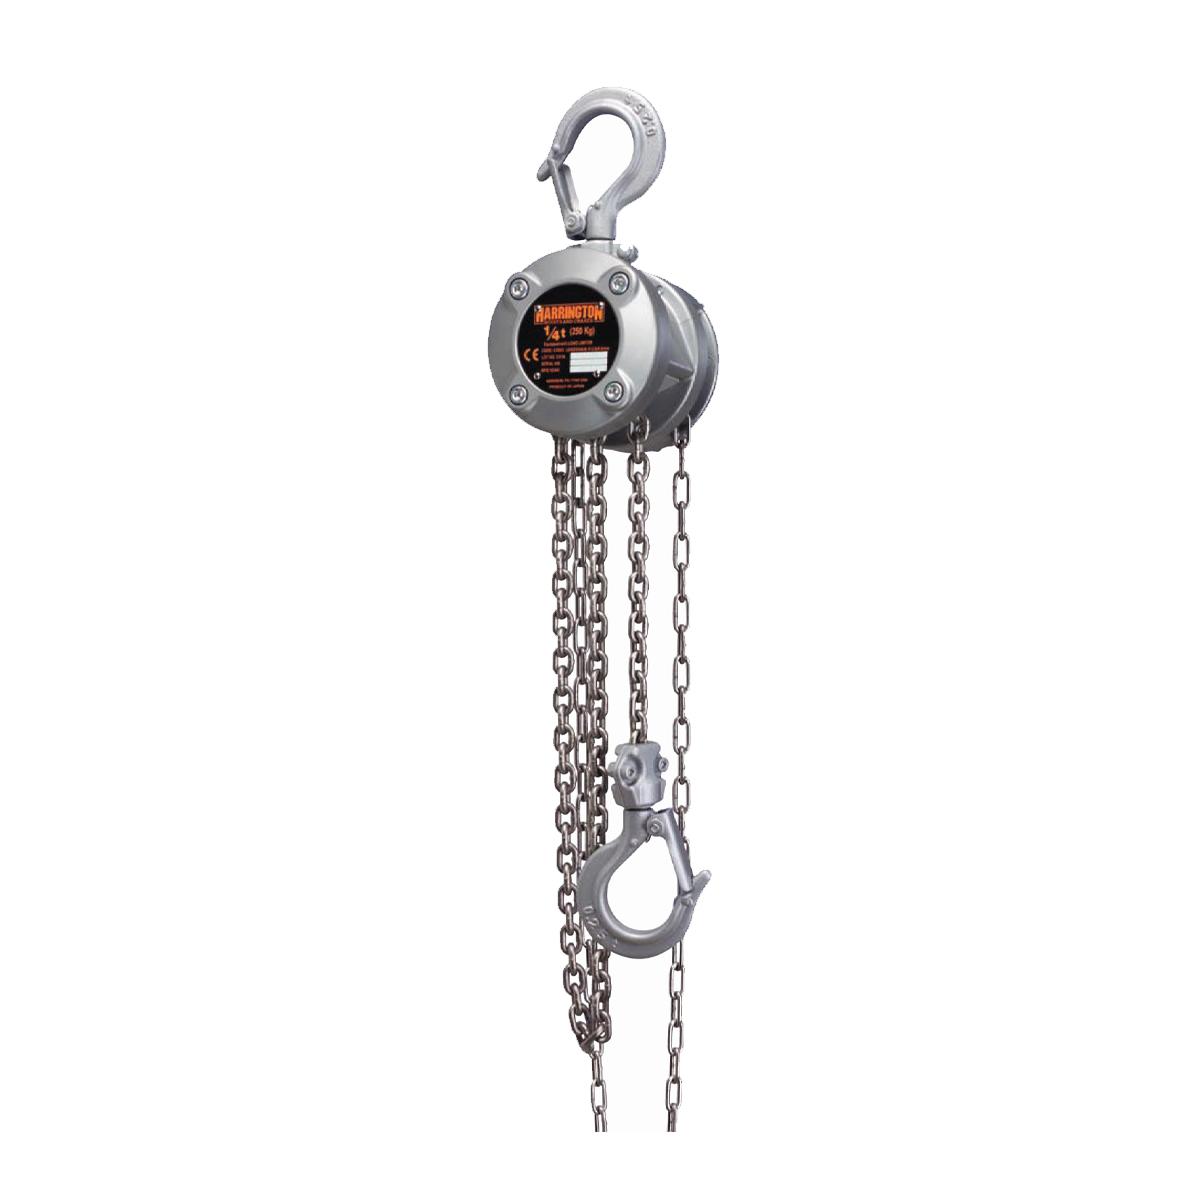 Harrington CX Mini Hand Chain Hoist